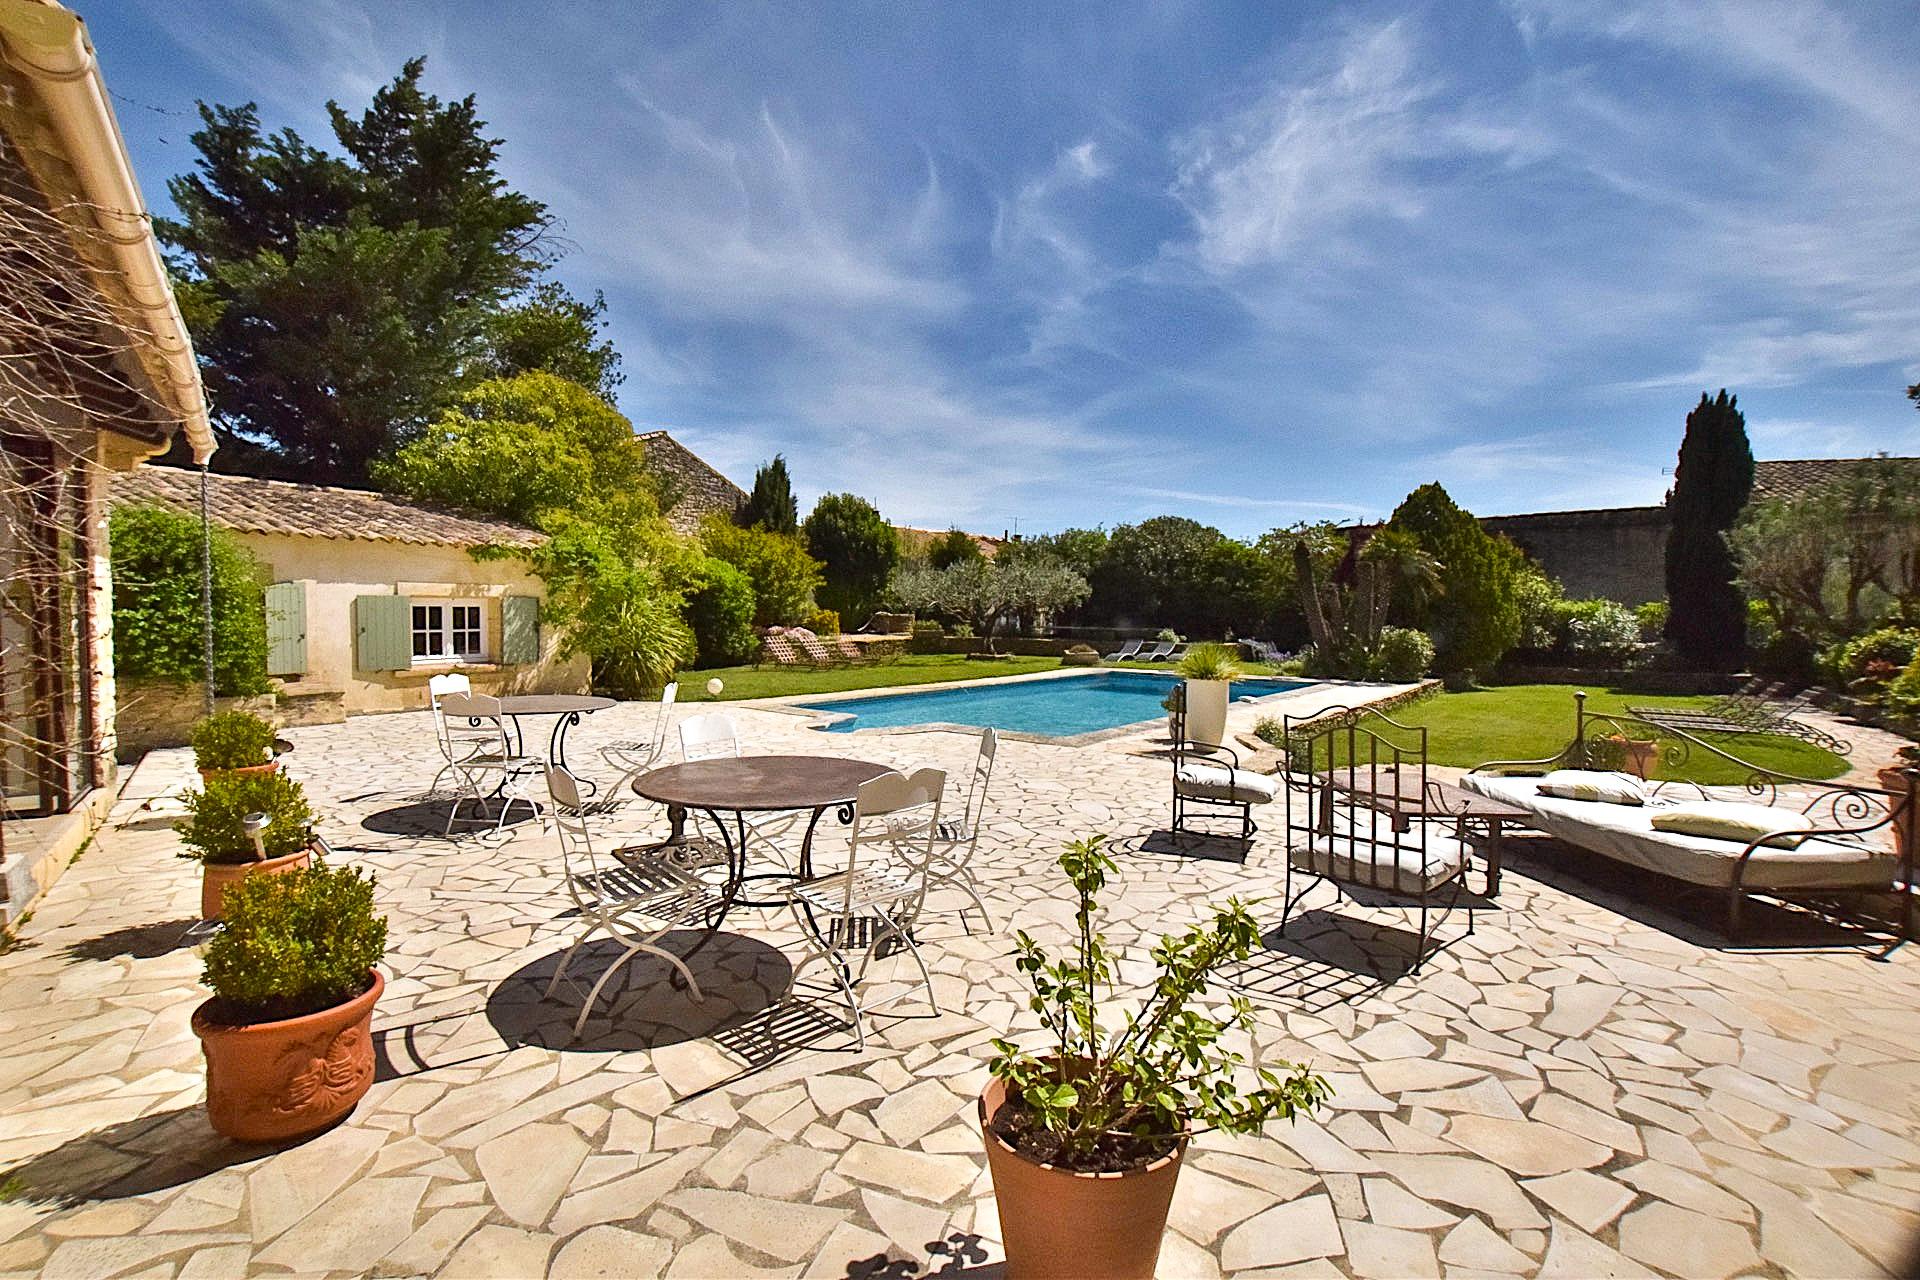 Uzès – Avignon, magnificent Mas with independent apartments, pool, spa, landscaped grounds